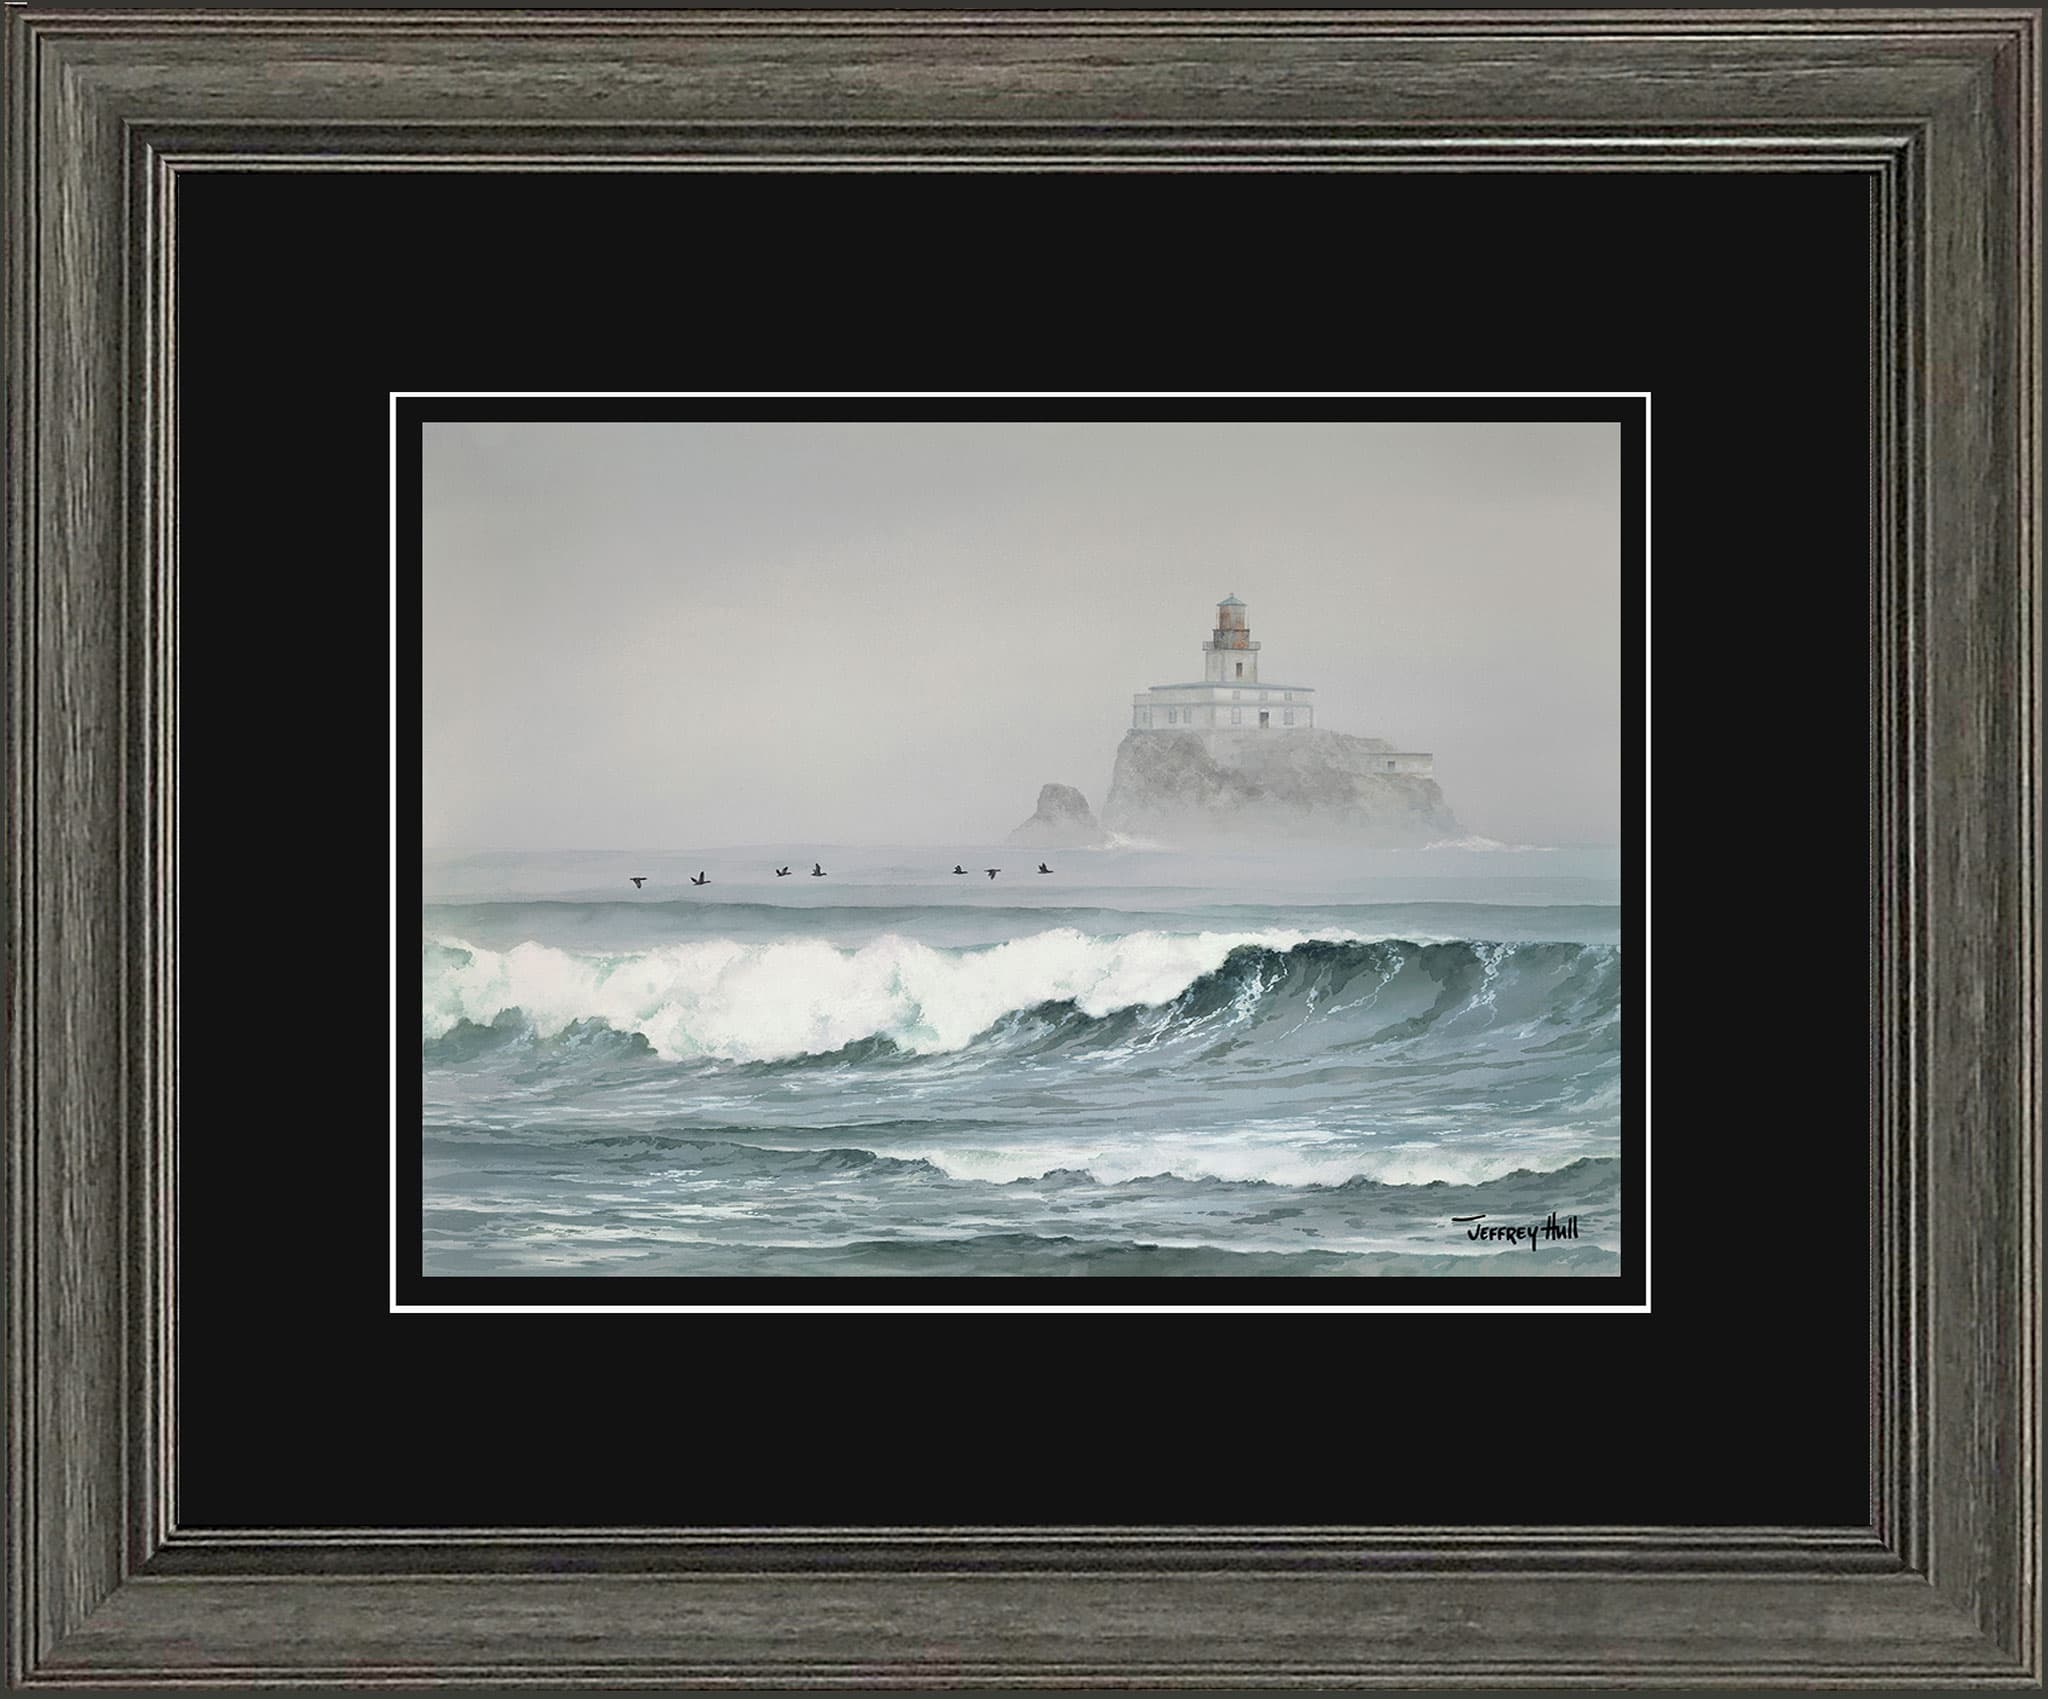 Tillamook-Rock-Lighthouse-OpenEd-Cascade-Jet-Black-4-Website-2021